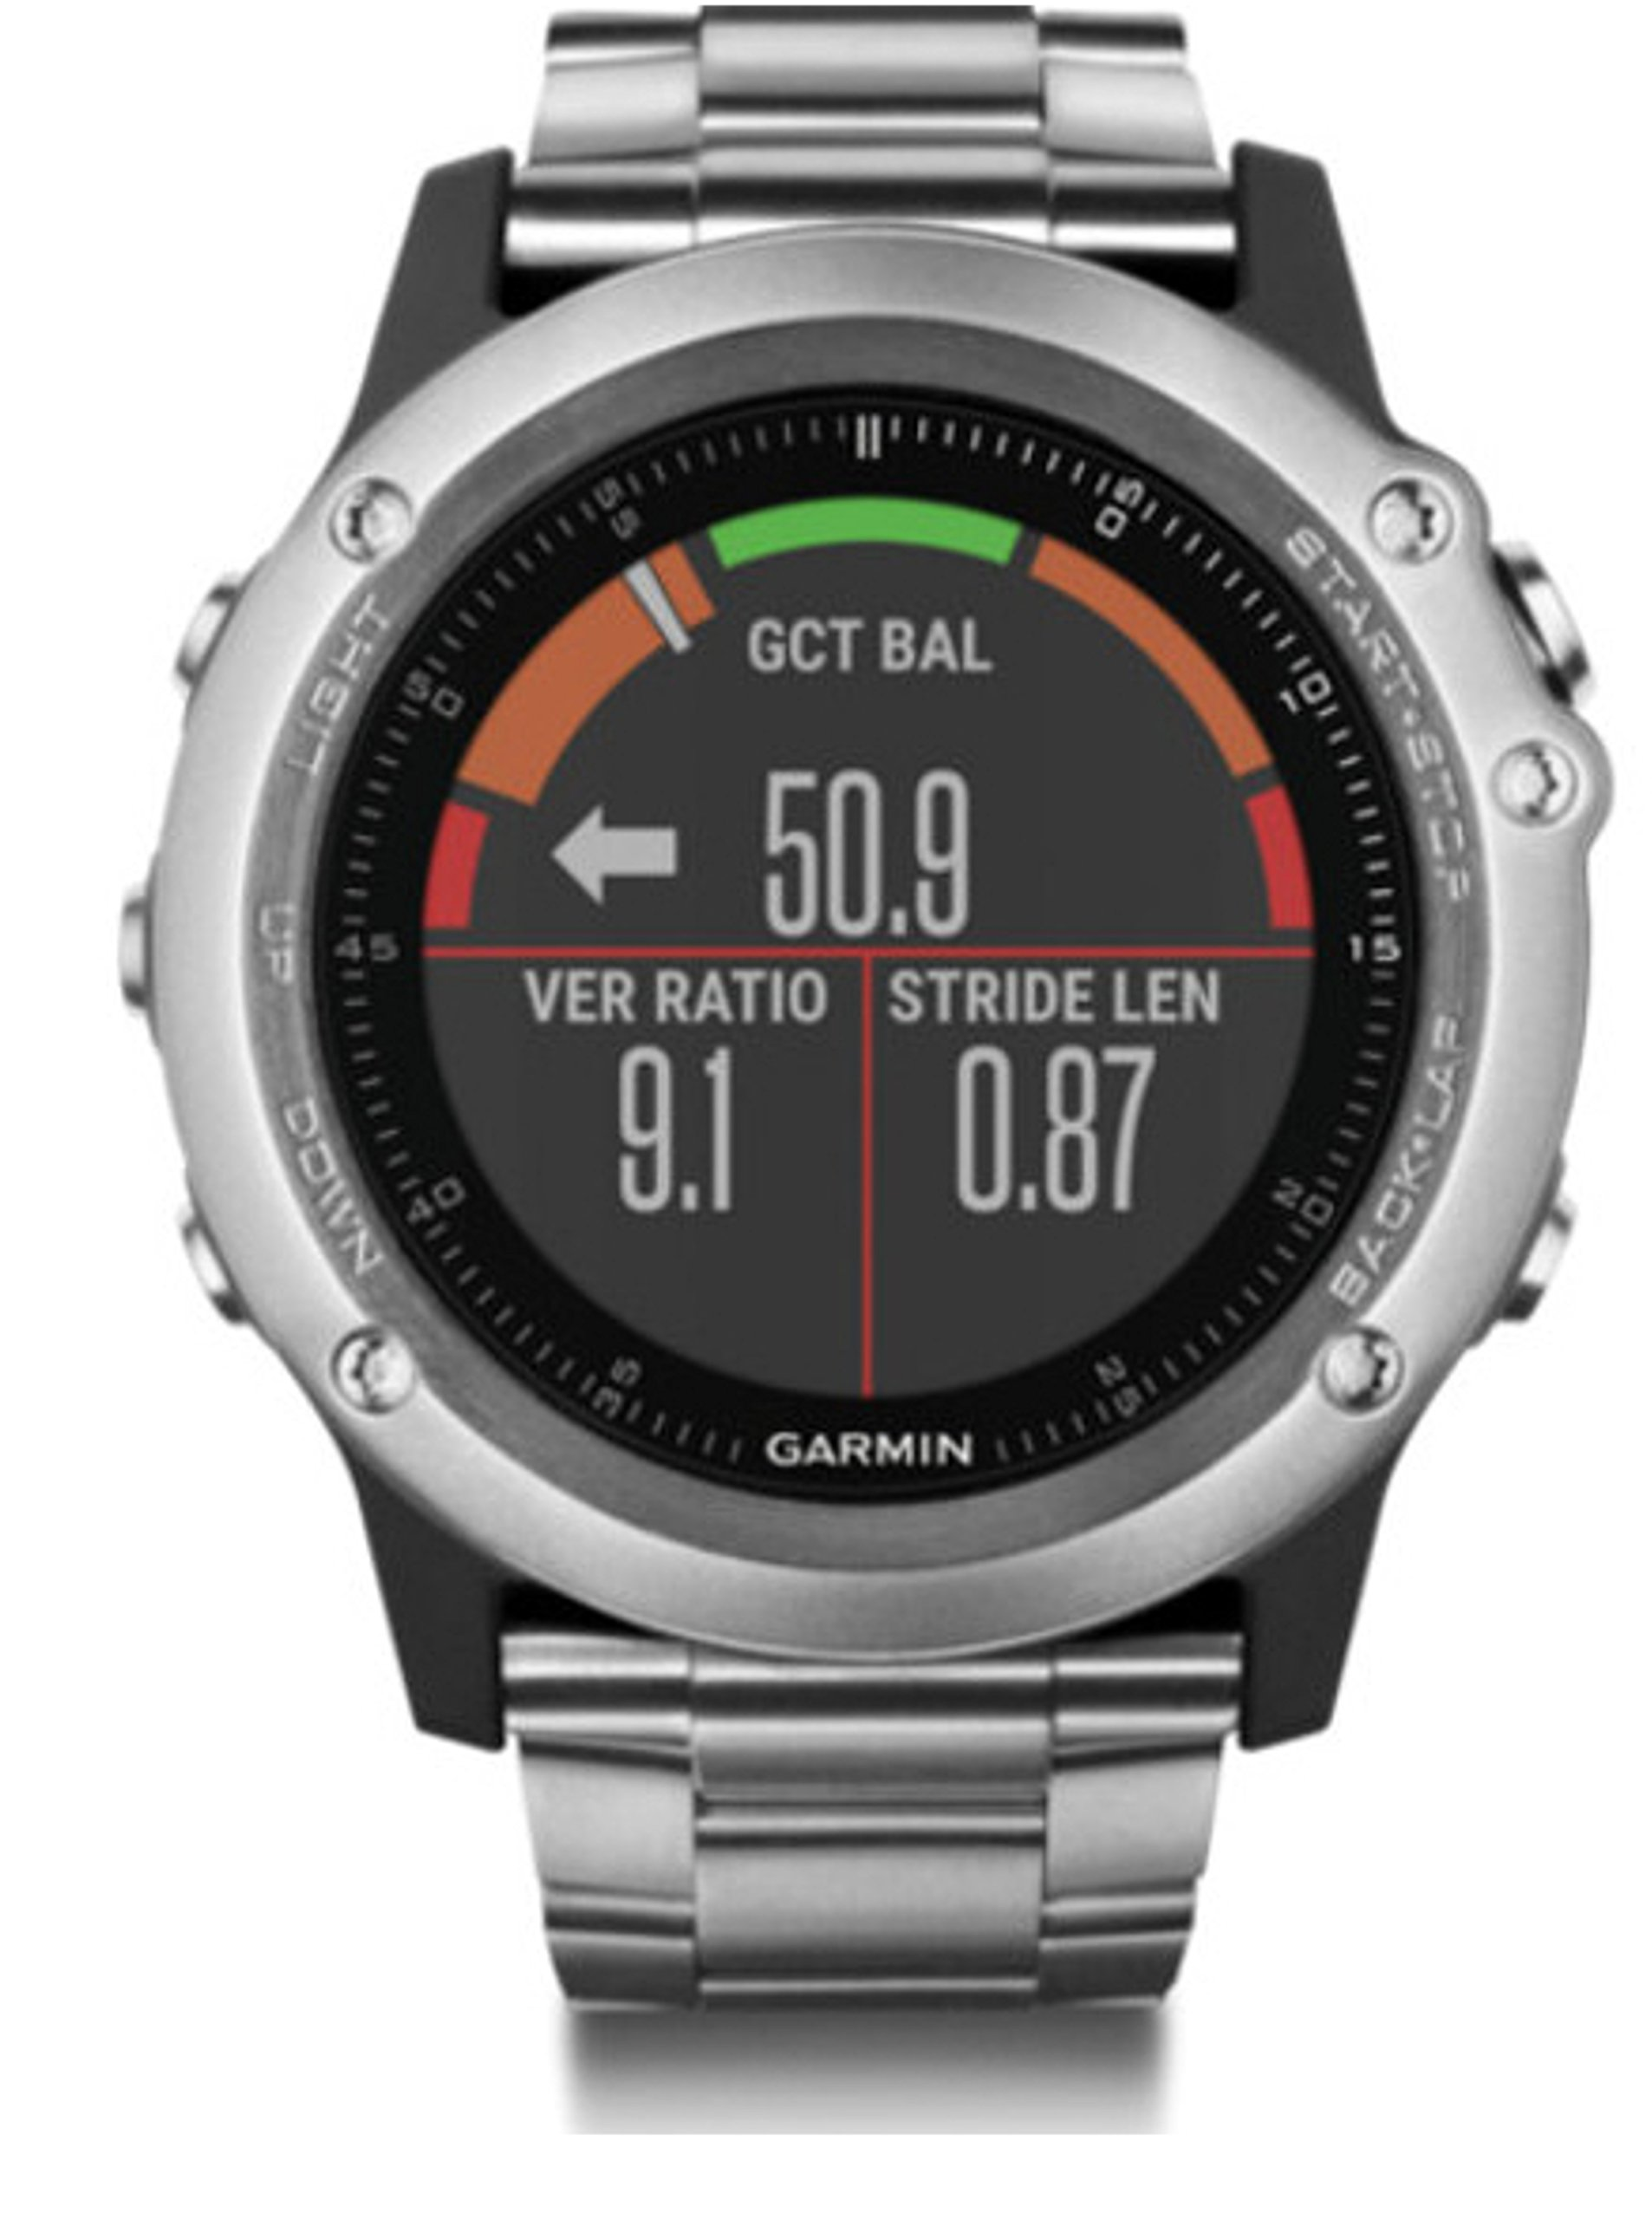 Garmin Fenix 3 HR Smartwatch GPS Multisport, Sensore Cardio al Polso, Display a Colori, Altimetro e Bussola, Nero/Grigio 2 spesavip